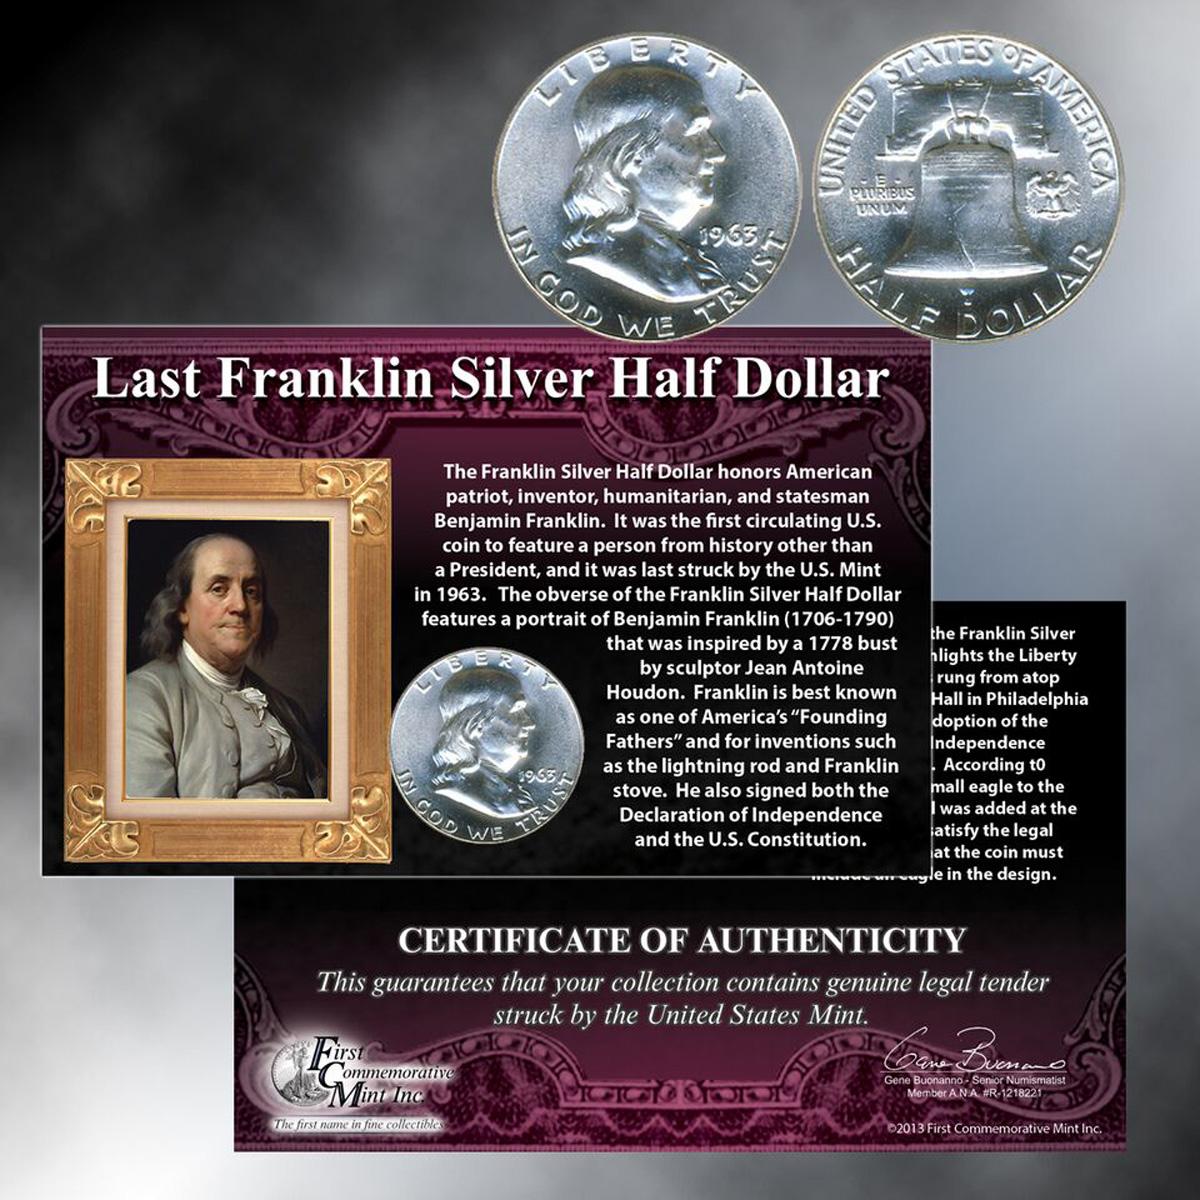 Last Franklin Silver Half Dollar